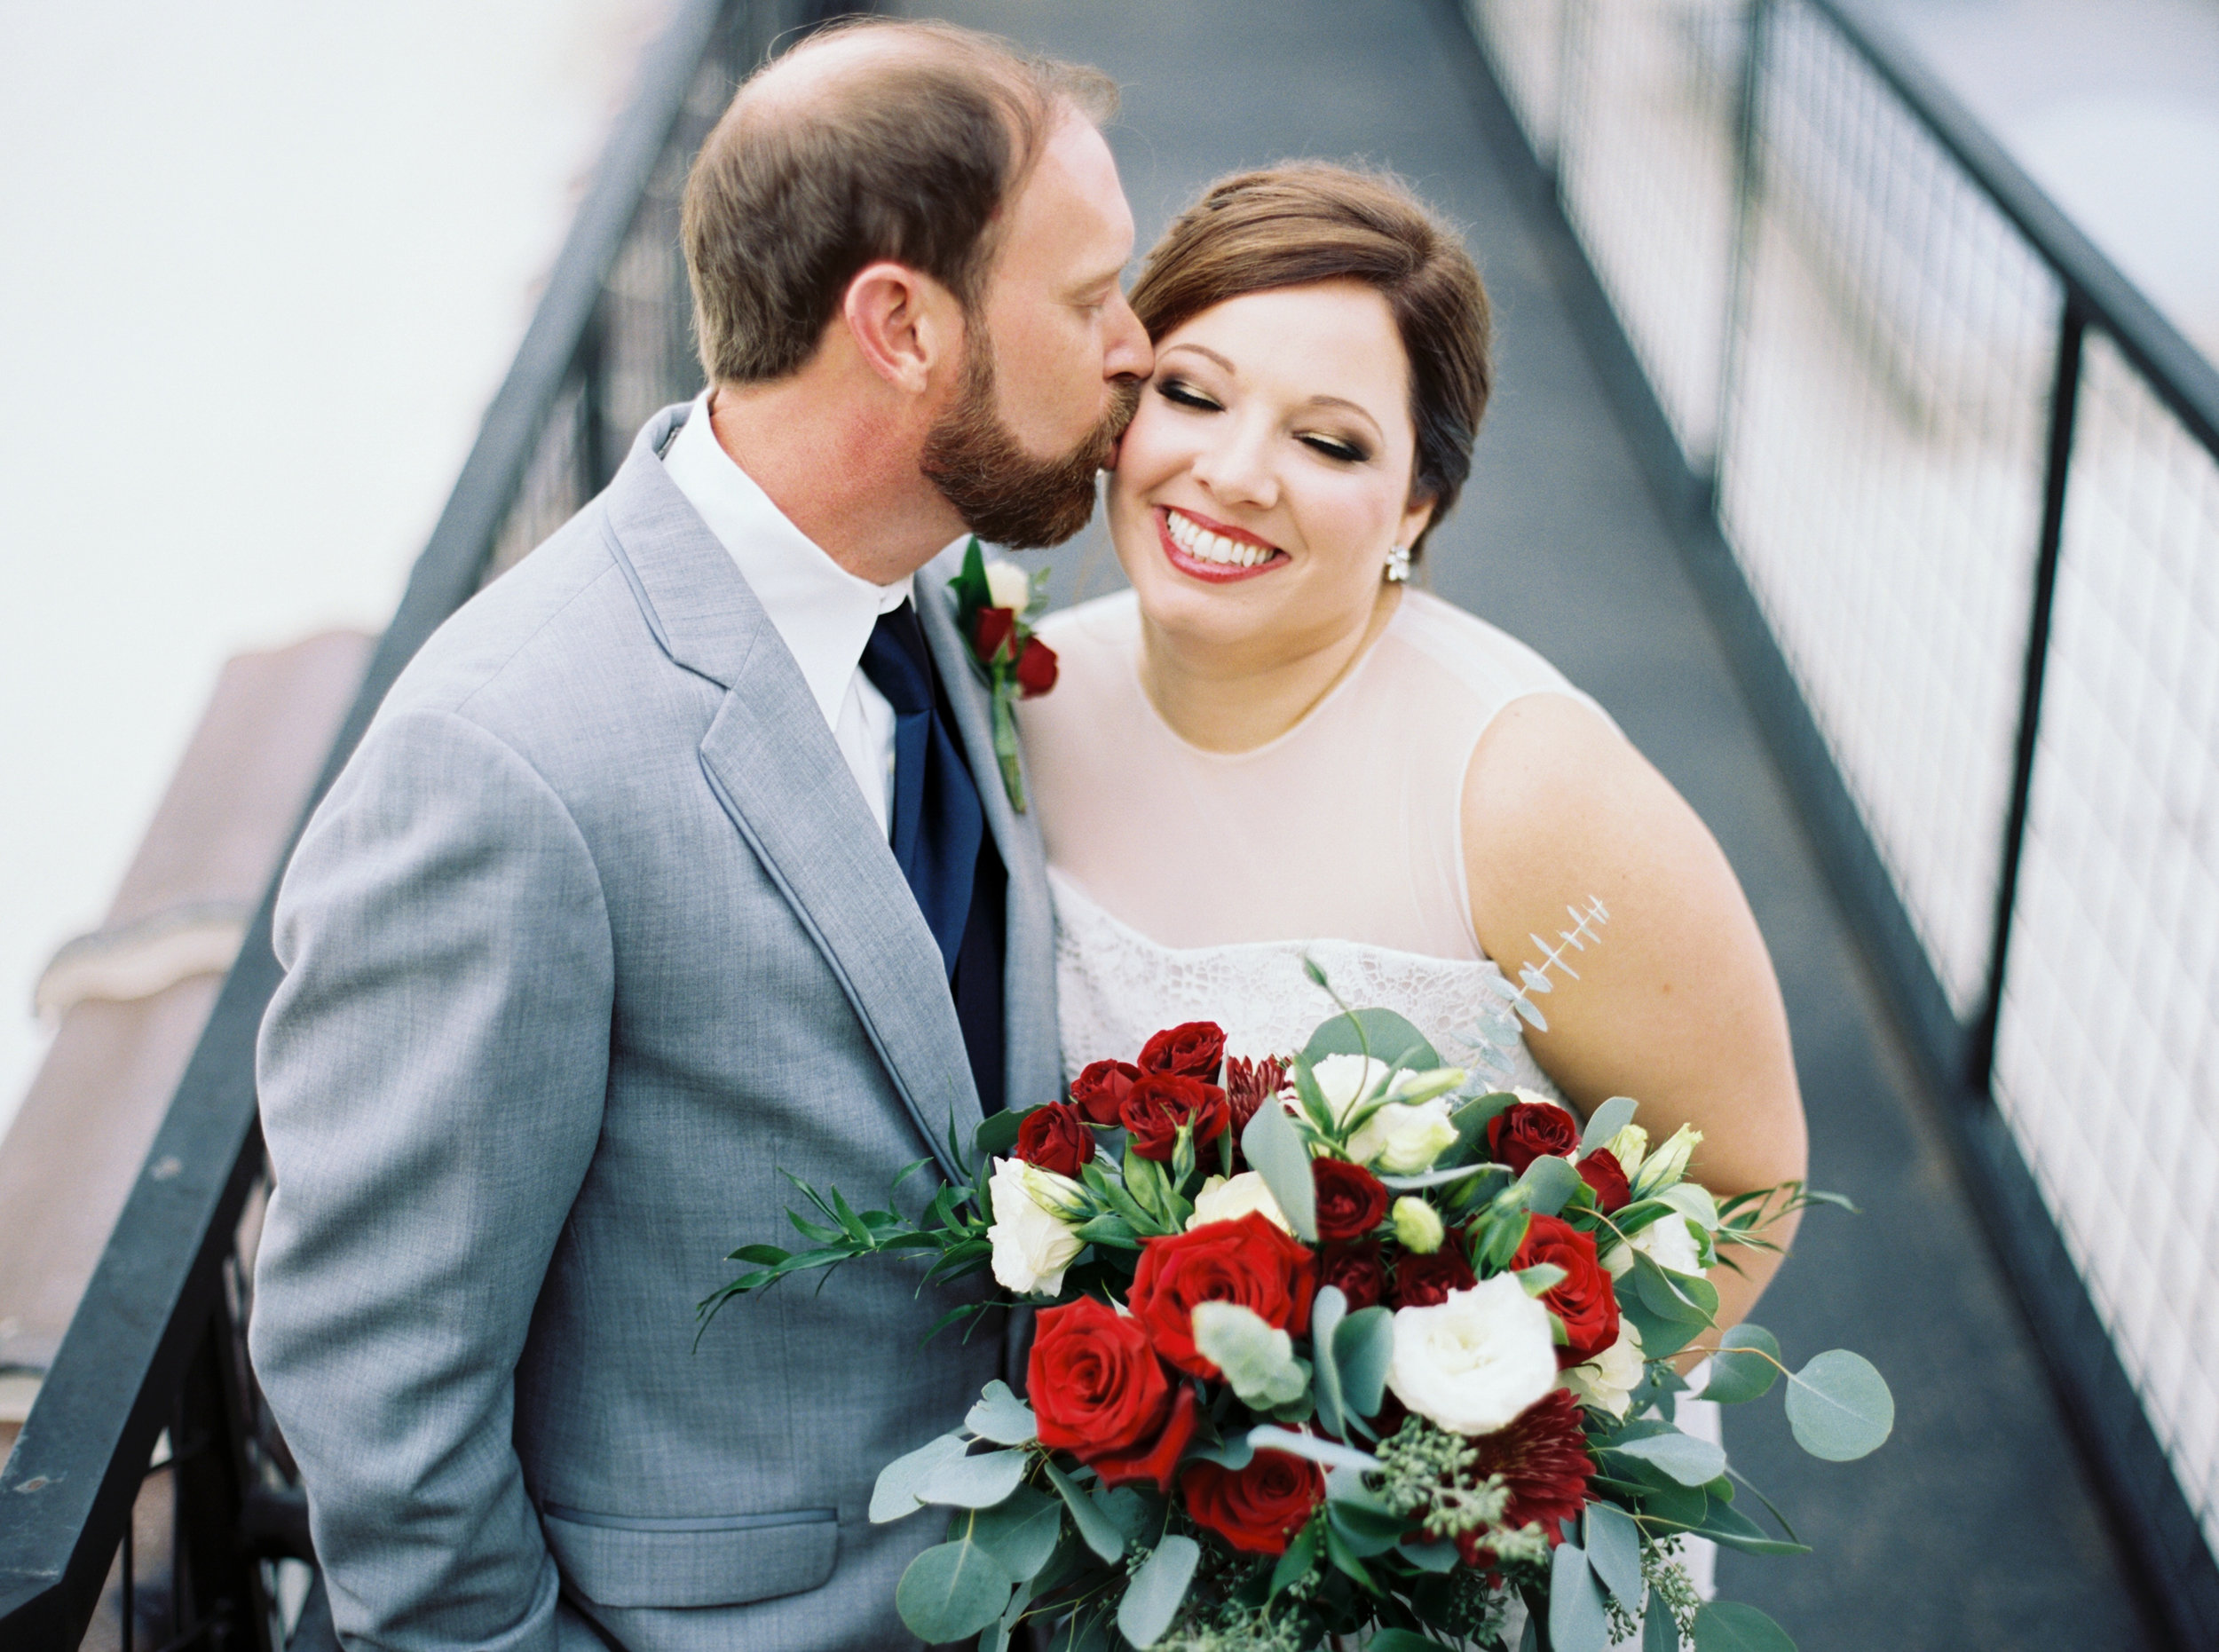 Jessica_Bryan_Wedding_Standard_Knoxville_Abigail_Malone_Photography-299.jpg